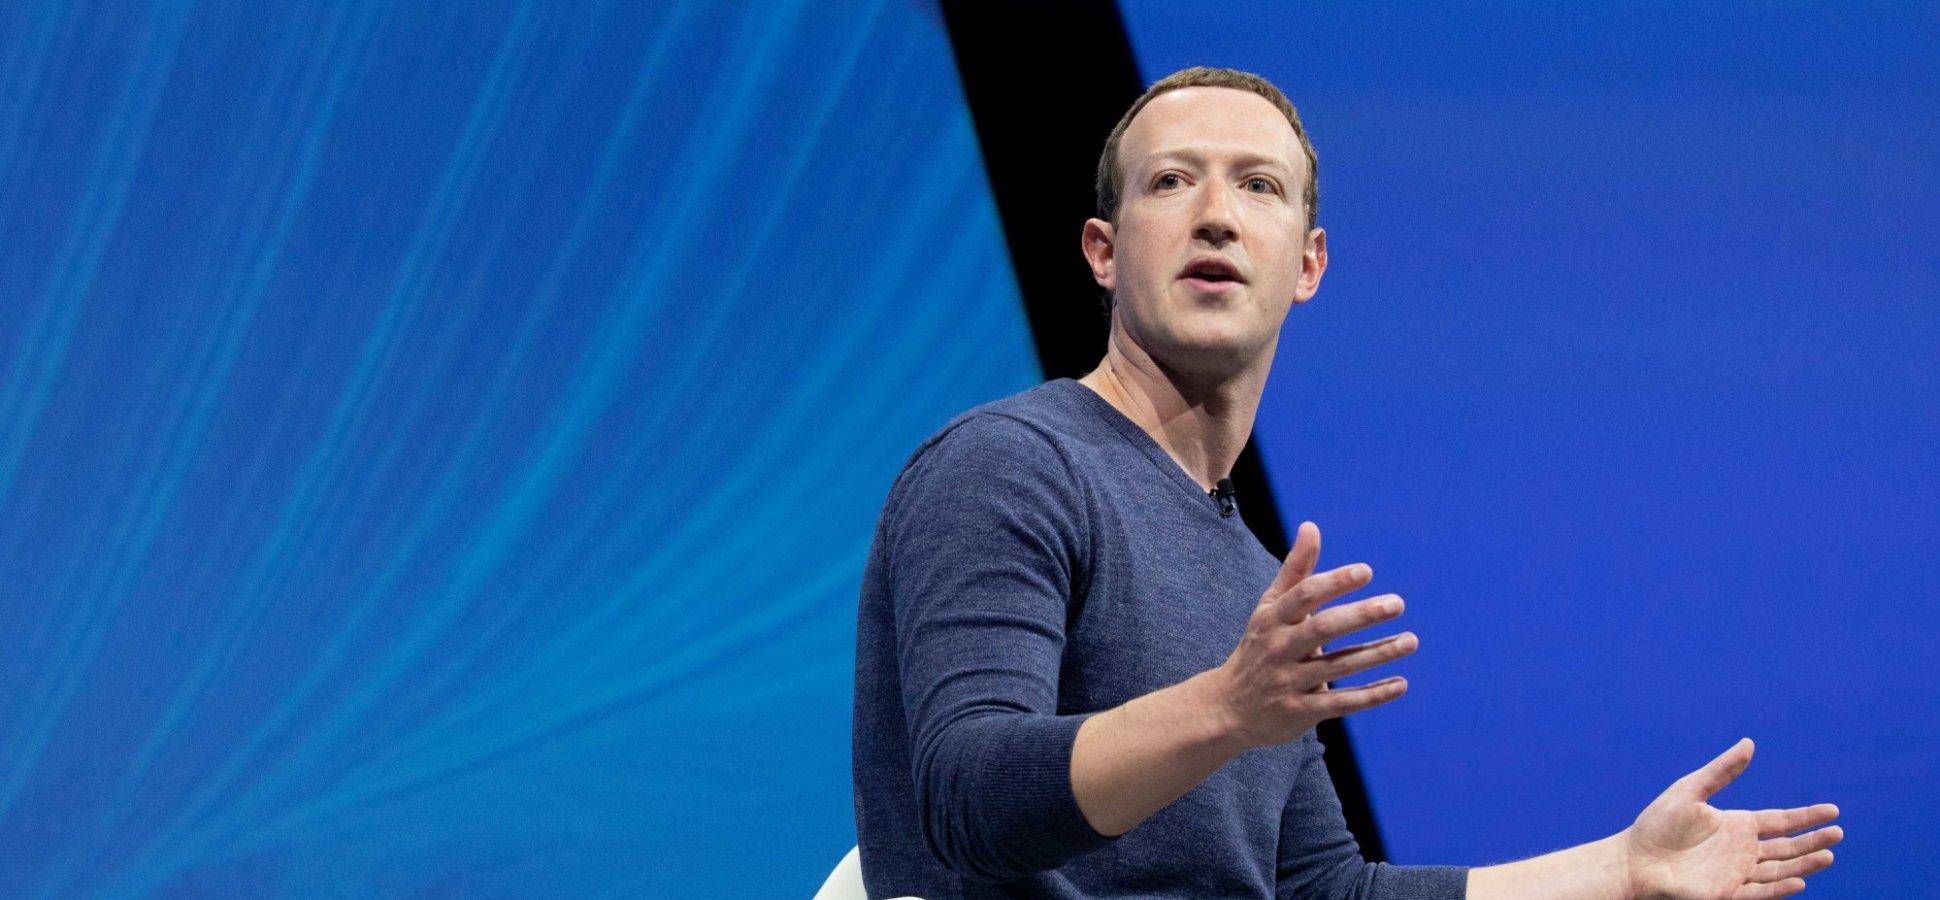 Fake Video of Mark Zuckerberg Tests Facebook's Doctored Video Policies